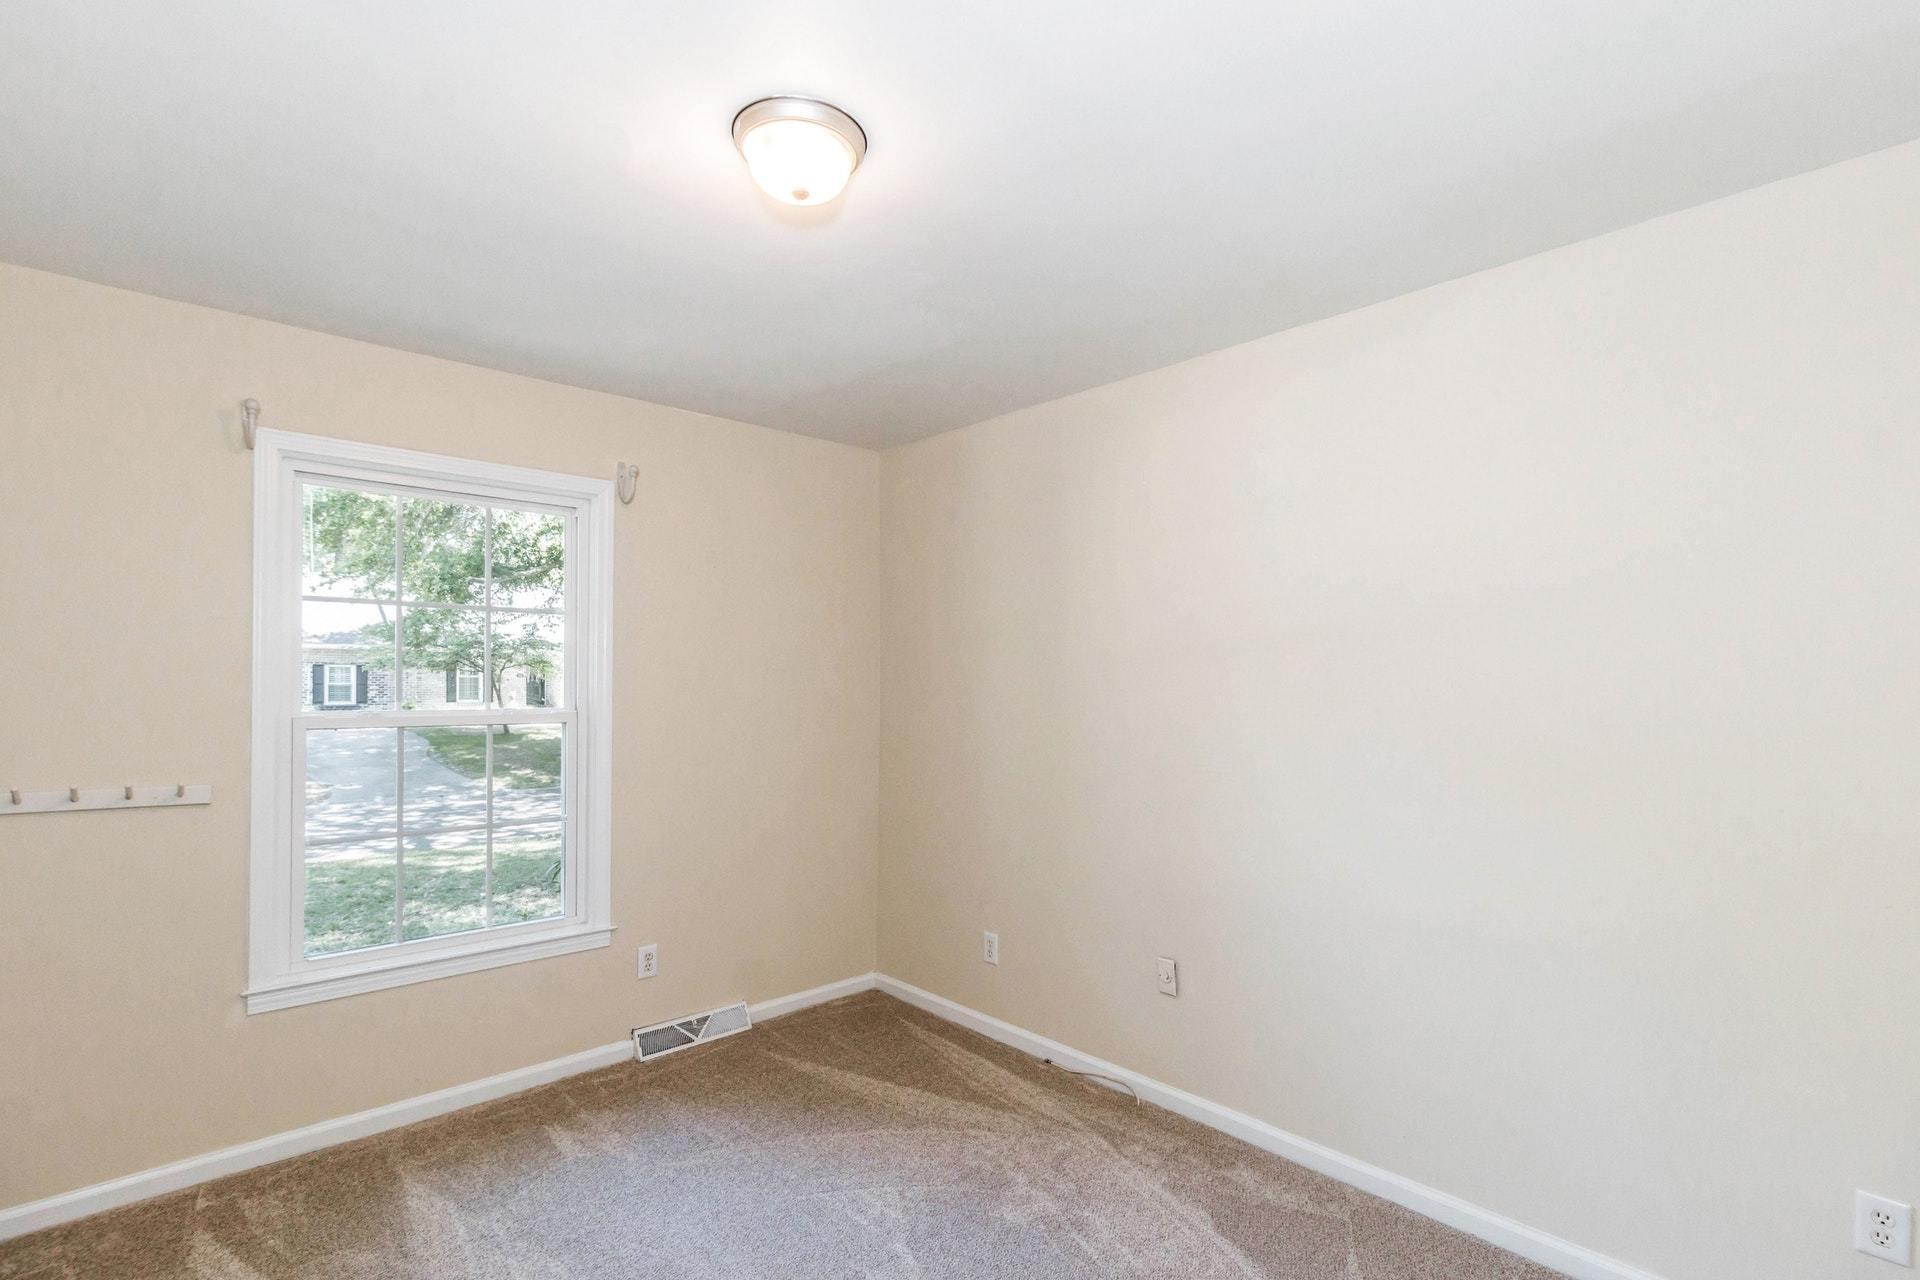 Shemwood II Homes For Sale - 969 Sea Gull, Mount Pleasant, SC - 11